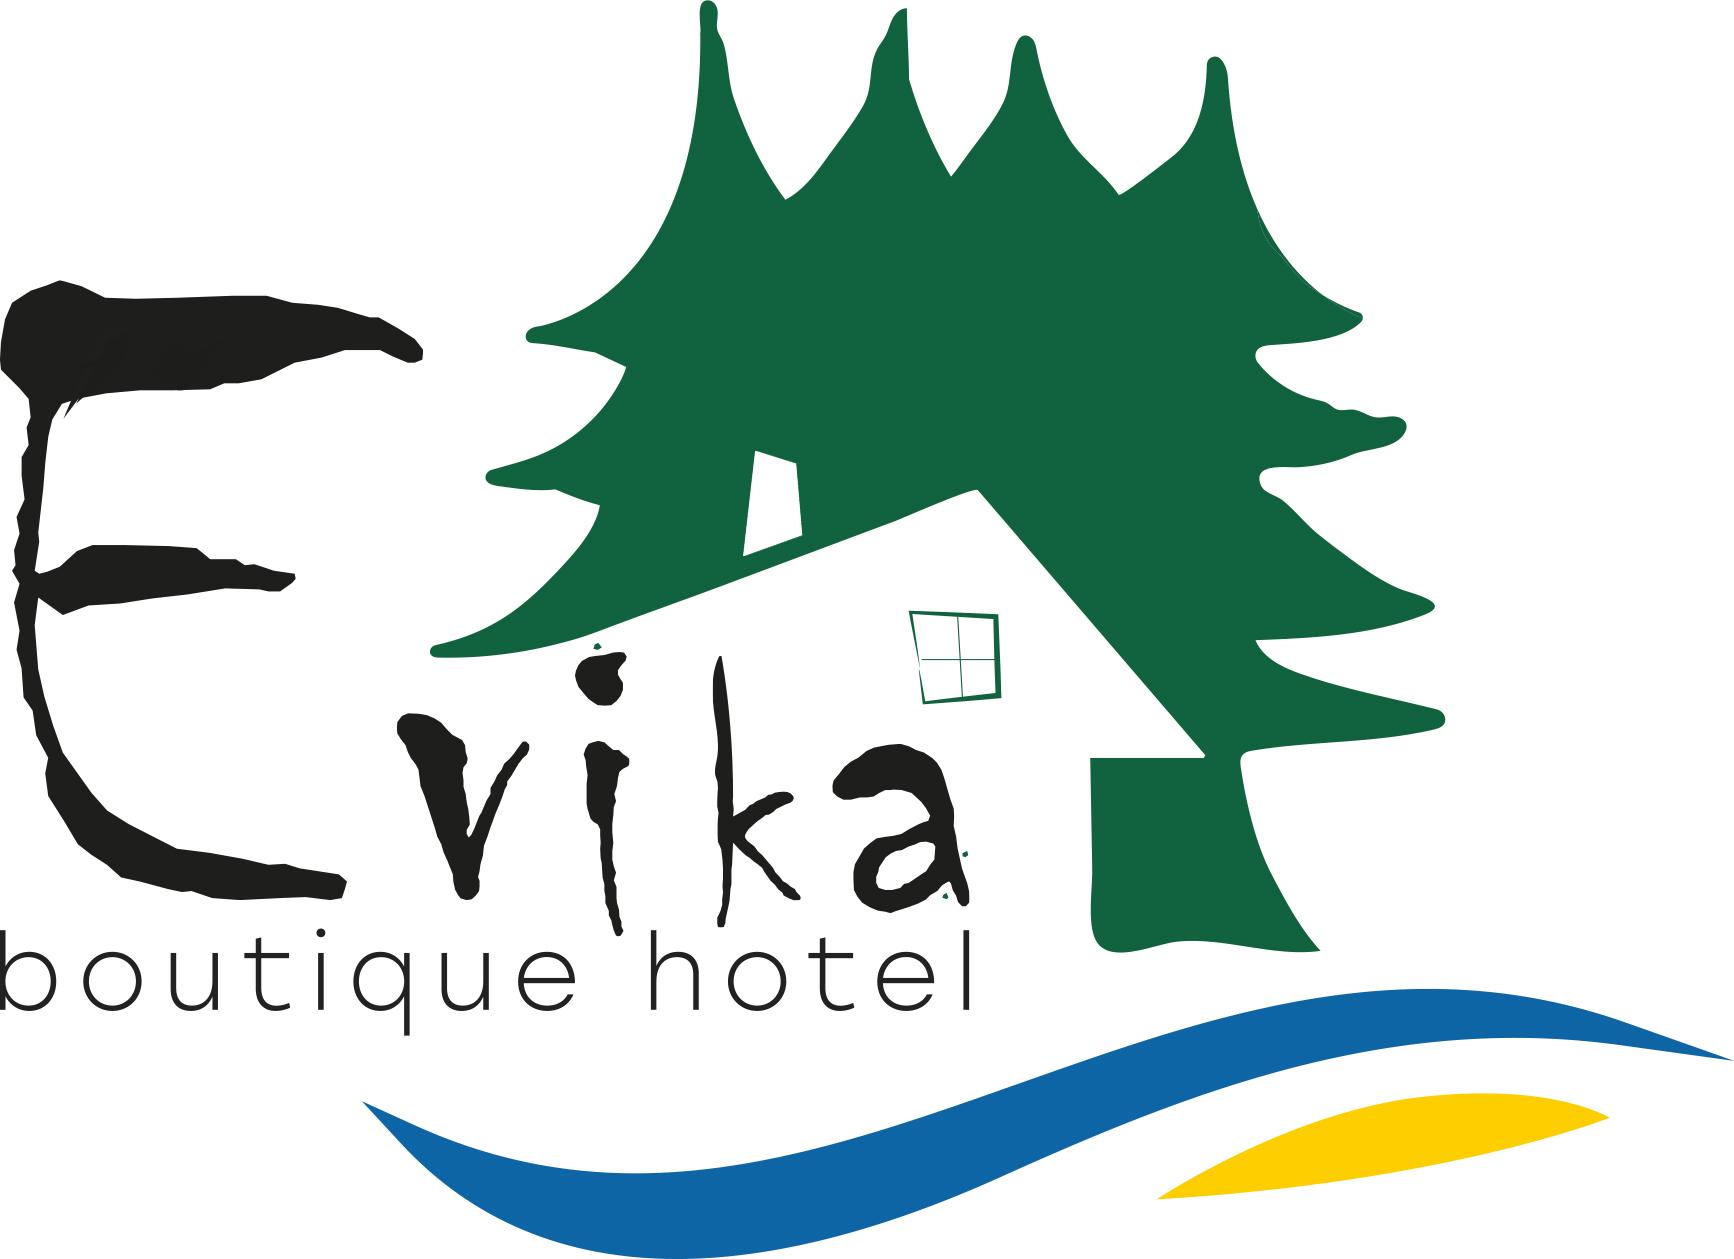 Evika boutique hotel